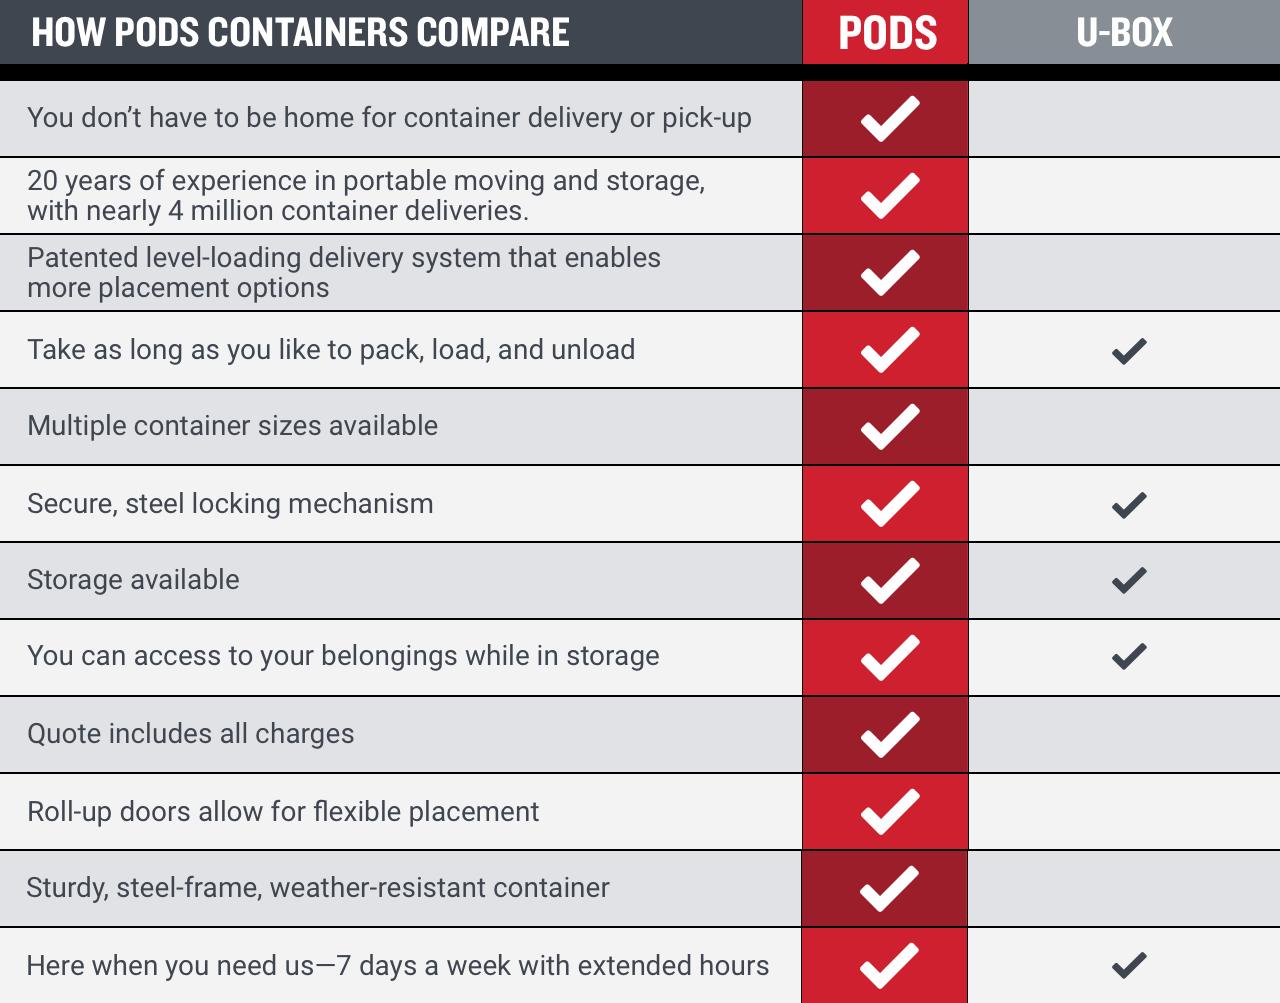 U-Box vs PODS